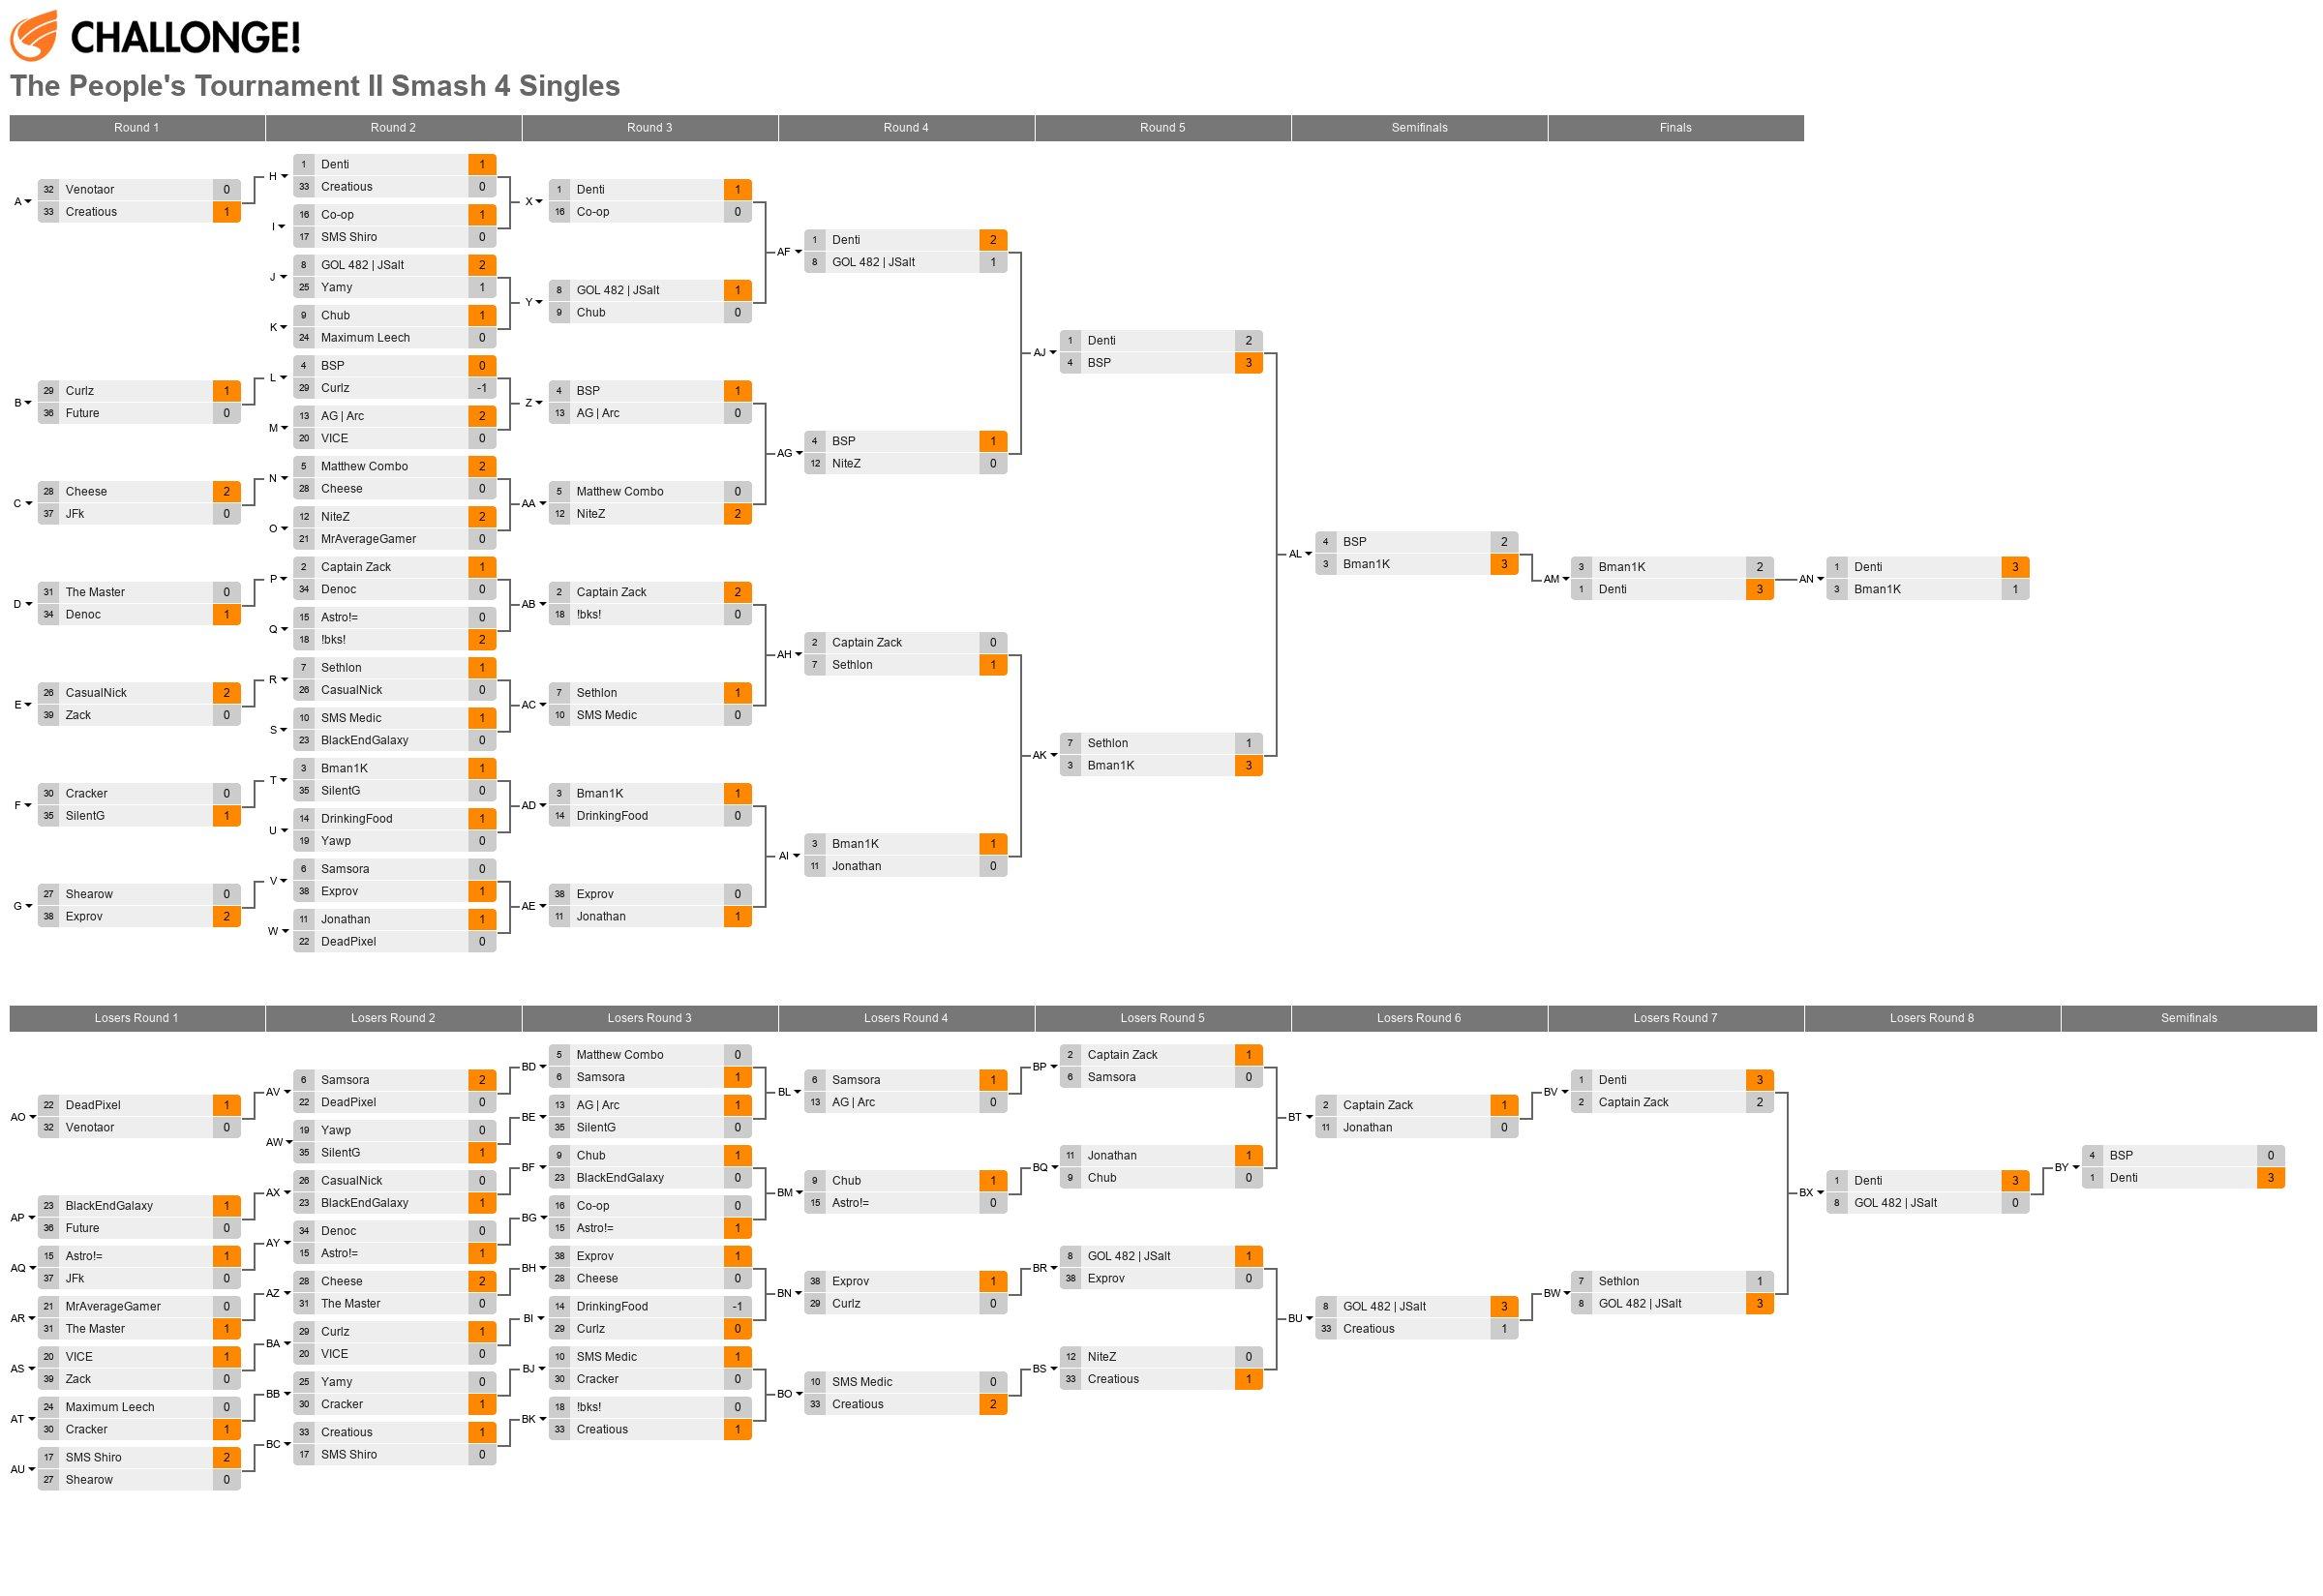 The People's Tournament II Smash 4 Singles